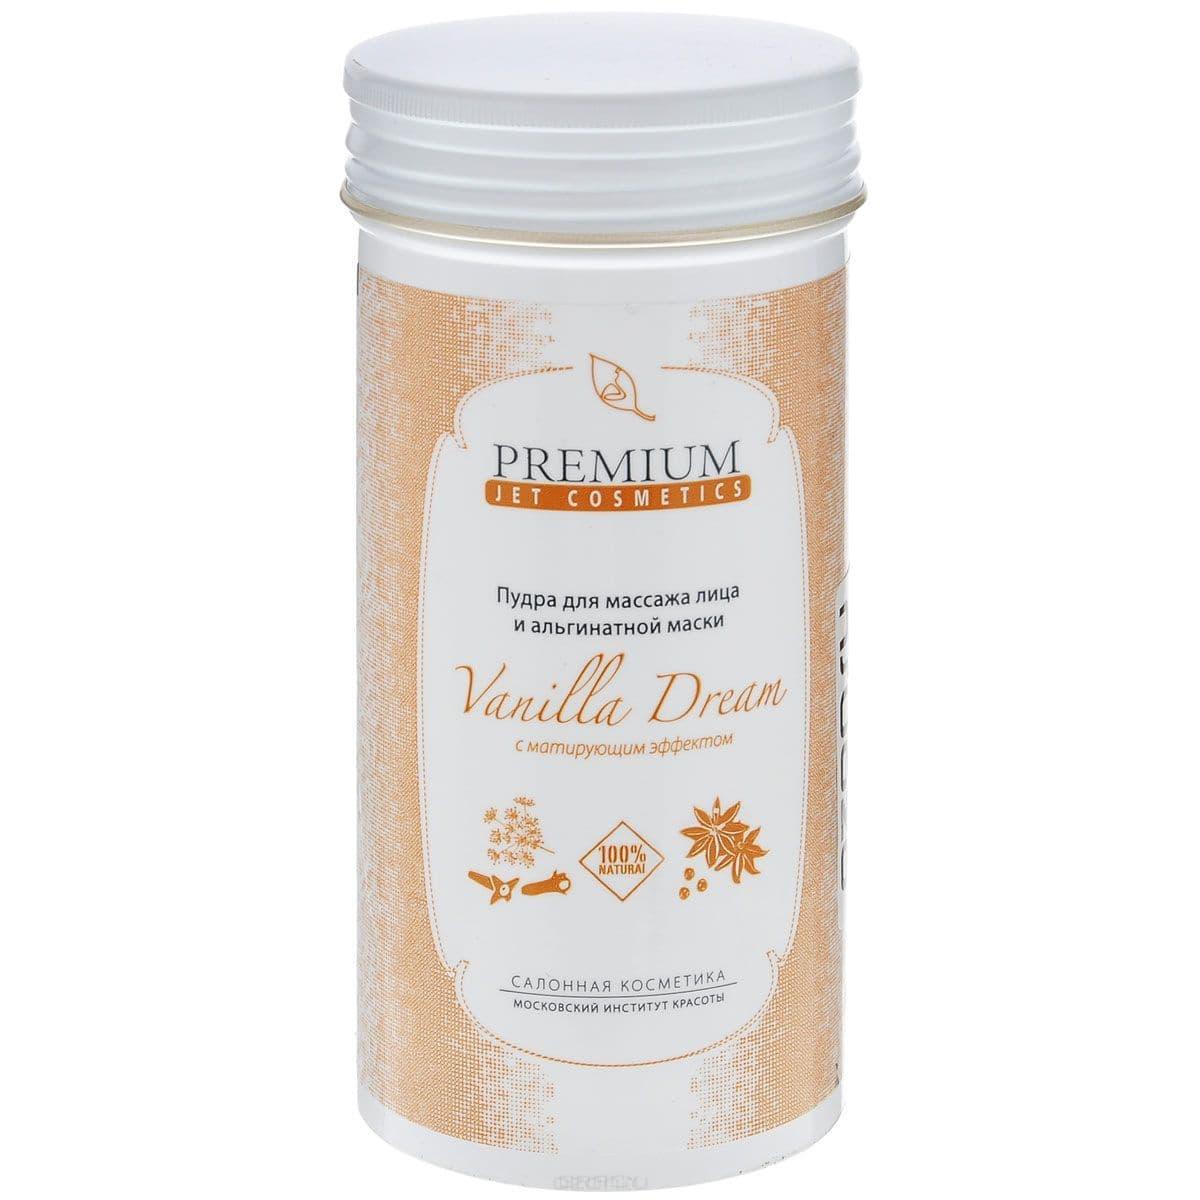 Альгинатная пудра-маска Vanilla dream, 150 гр ГП060007 alpino розовый 12 150 гр